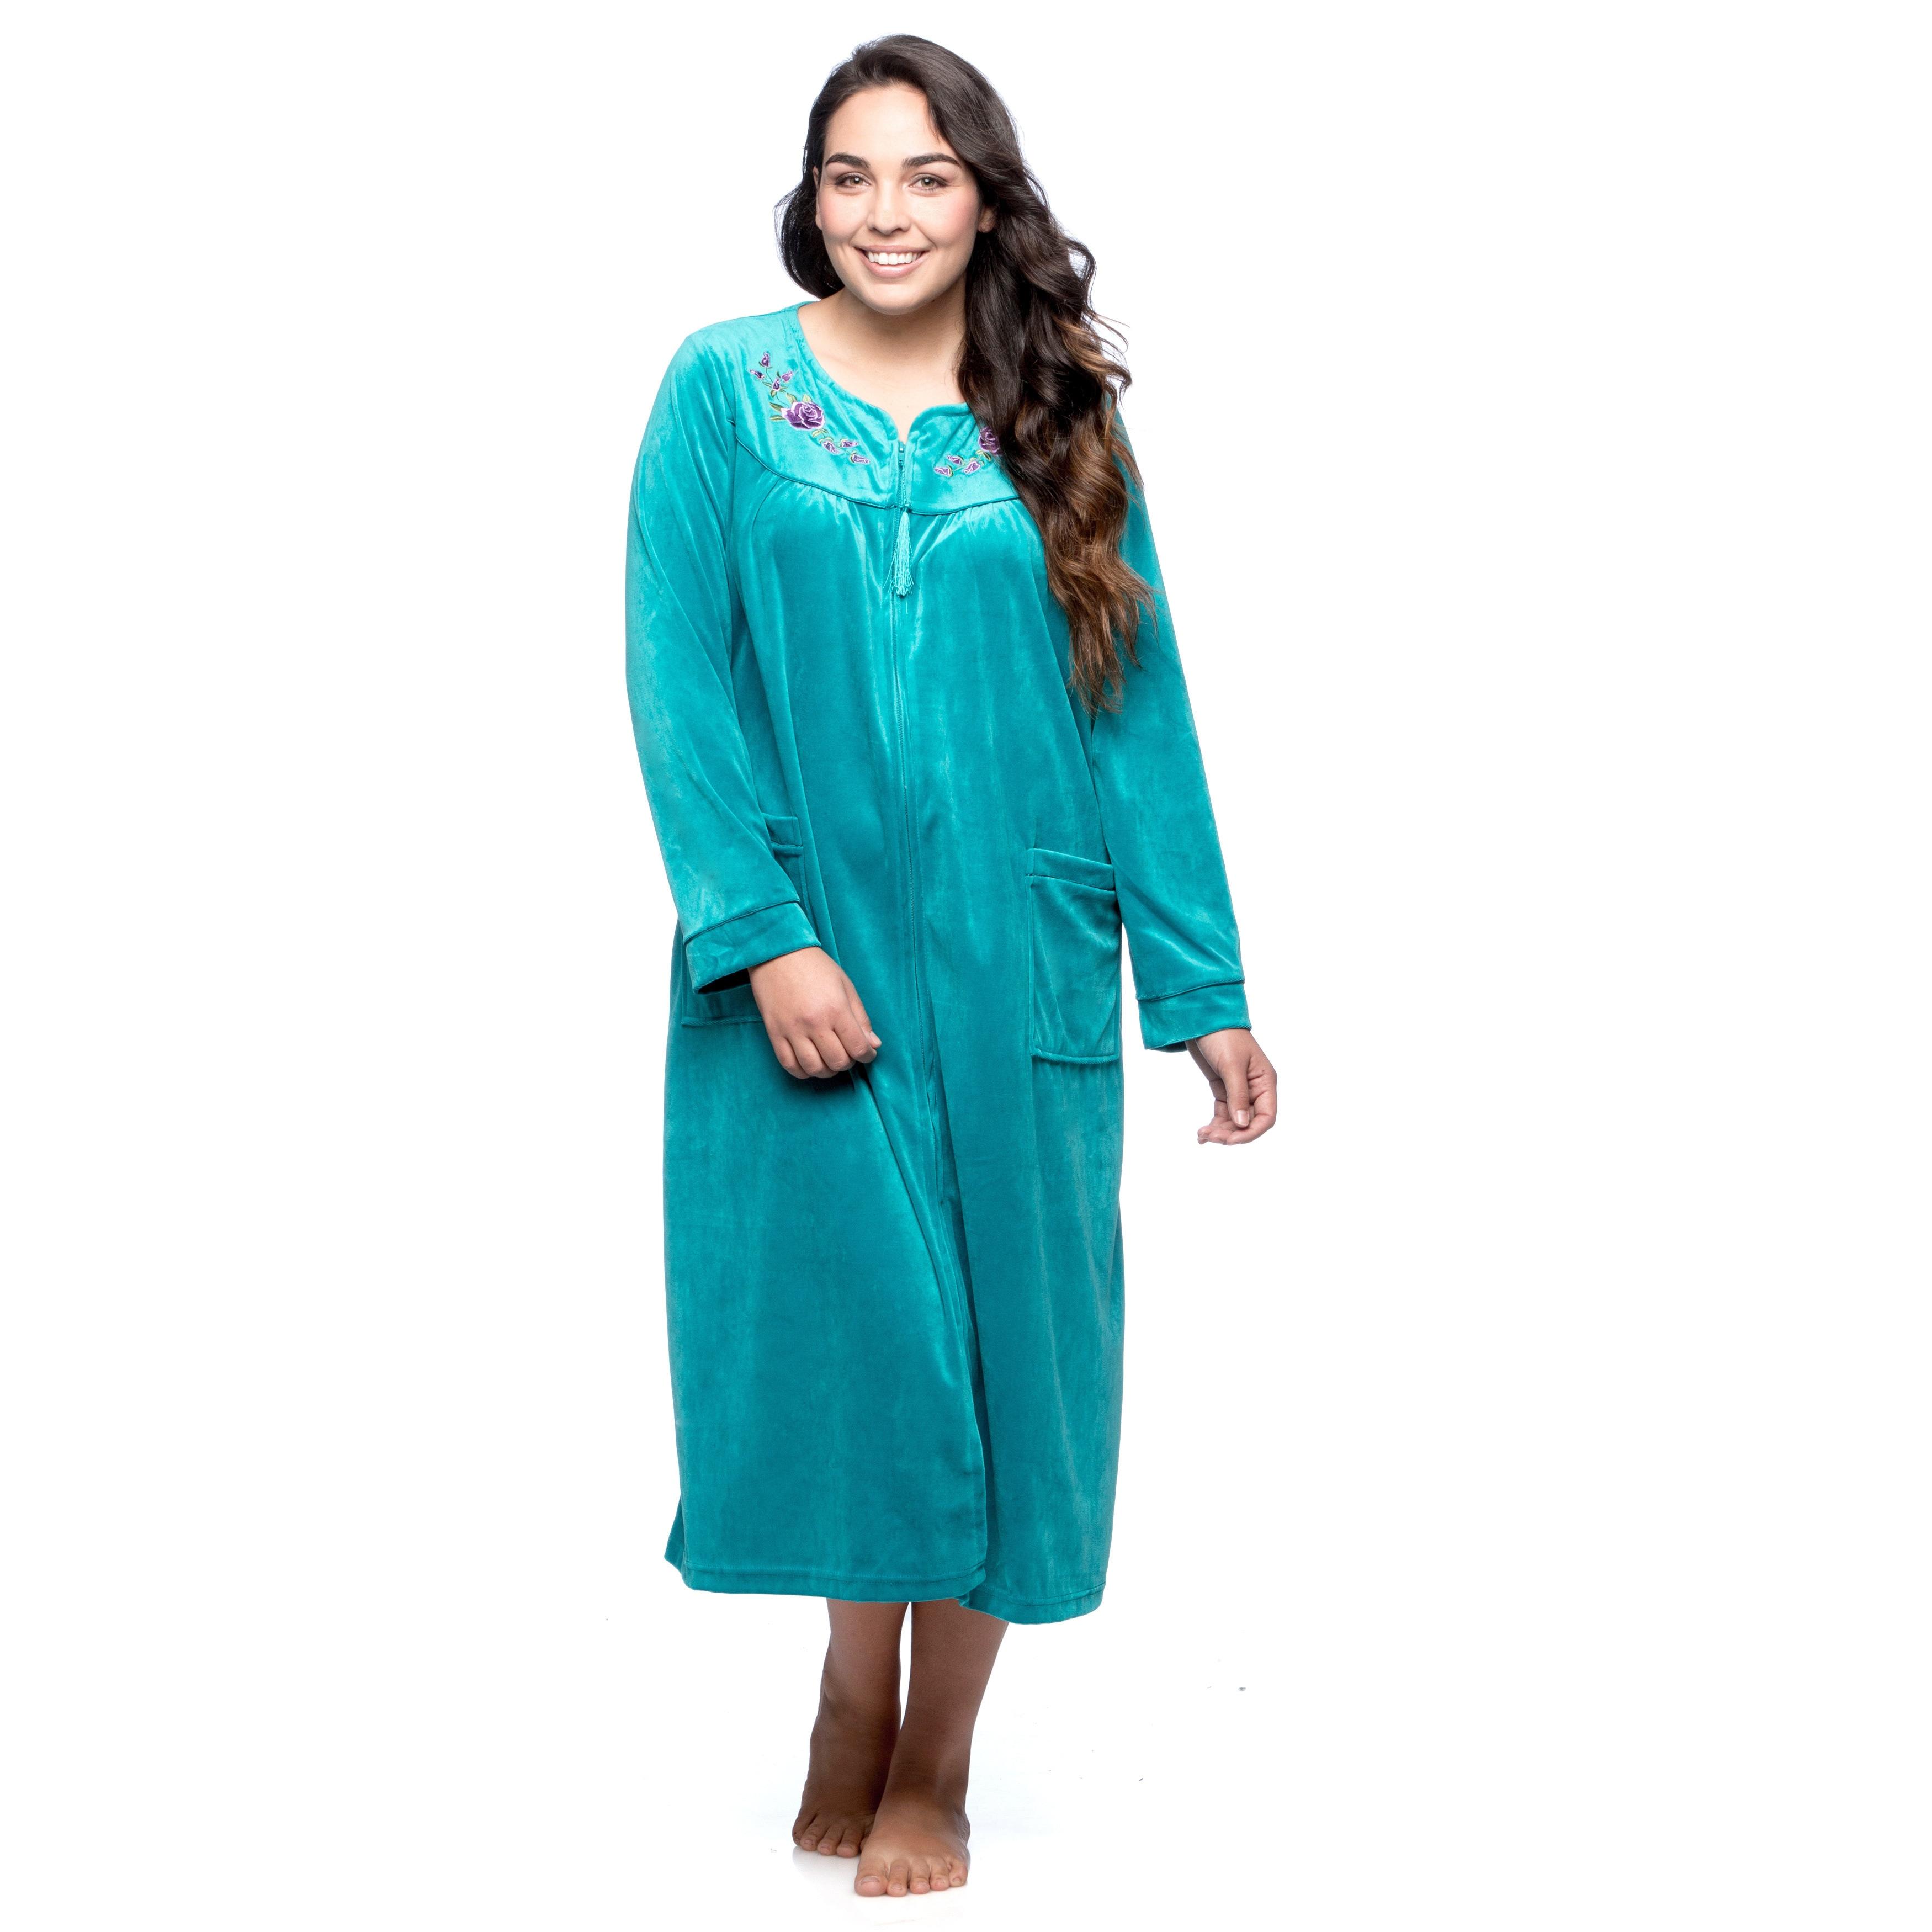 La Cera Womens Plus Size Zip Front Bath Robe On Sale Overstock 9518139 Teal 1x